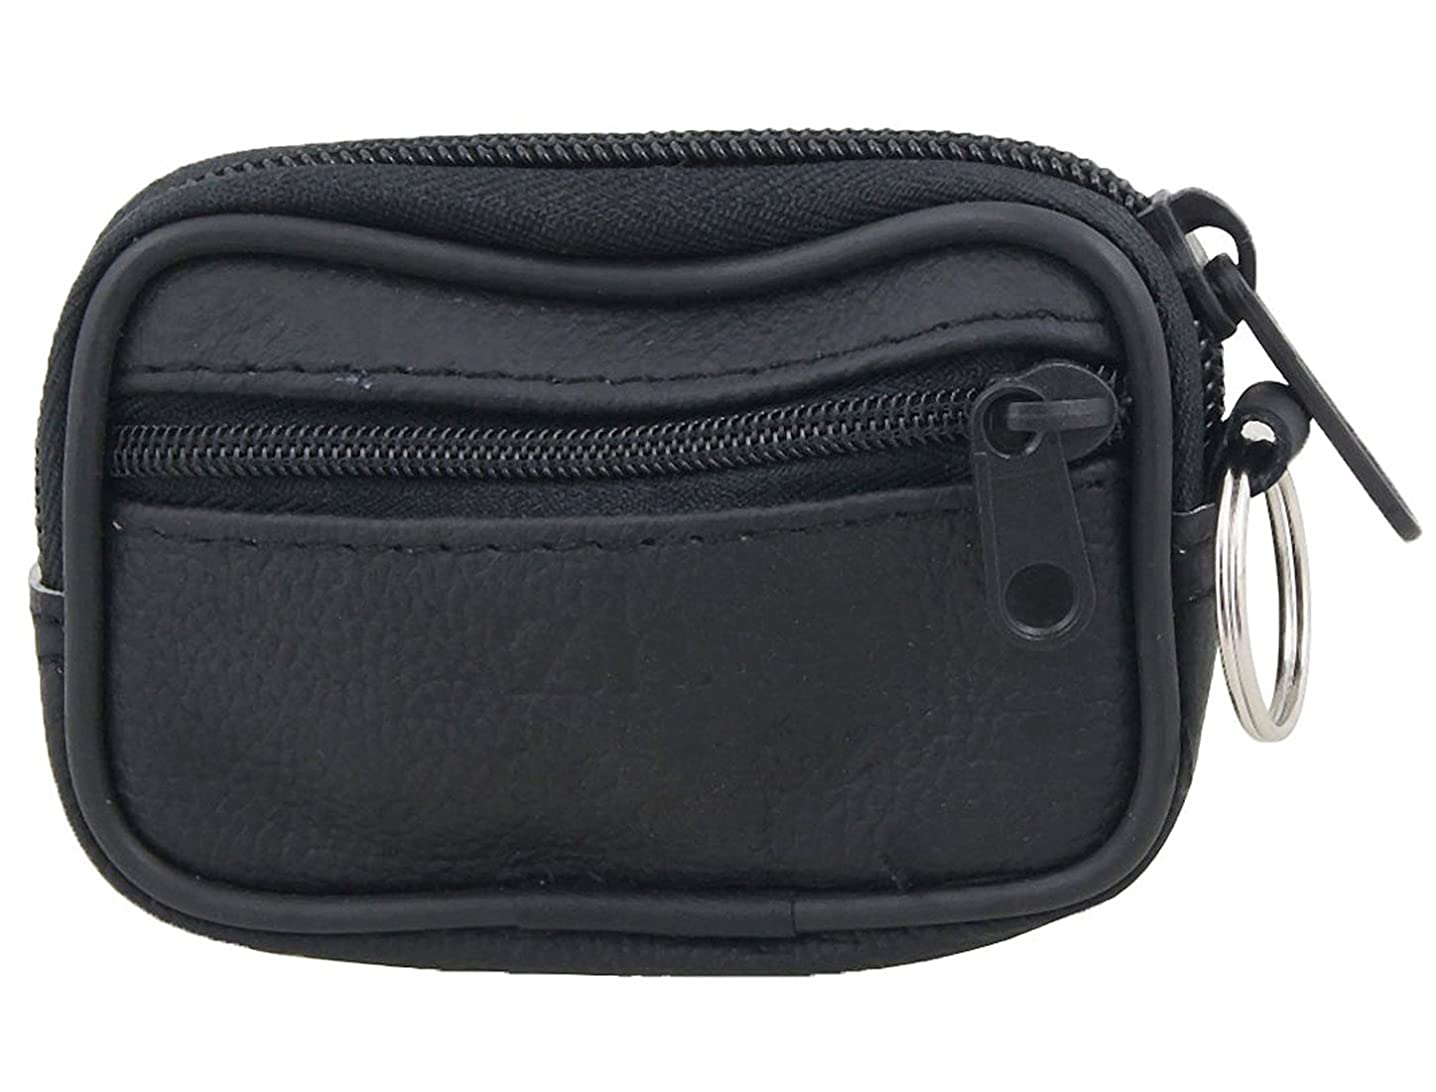 Black Faux Leather 2-Pocket Zippered Coin Keys Bag Purse